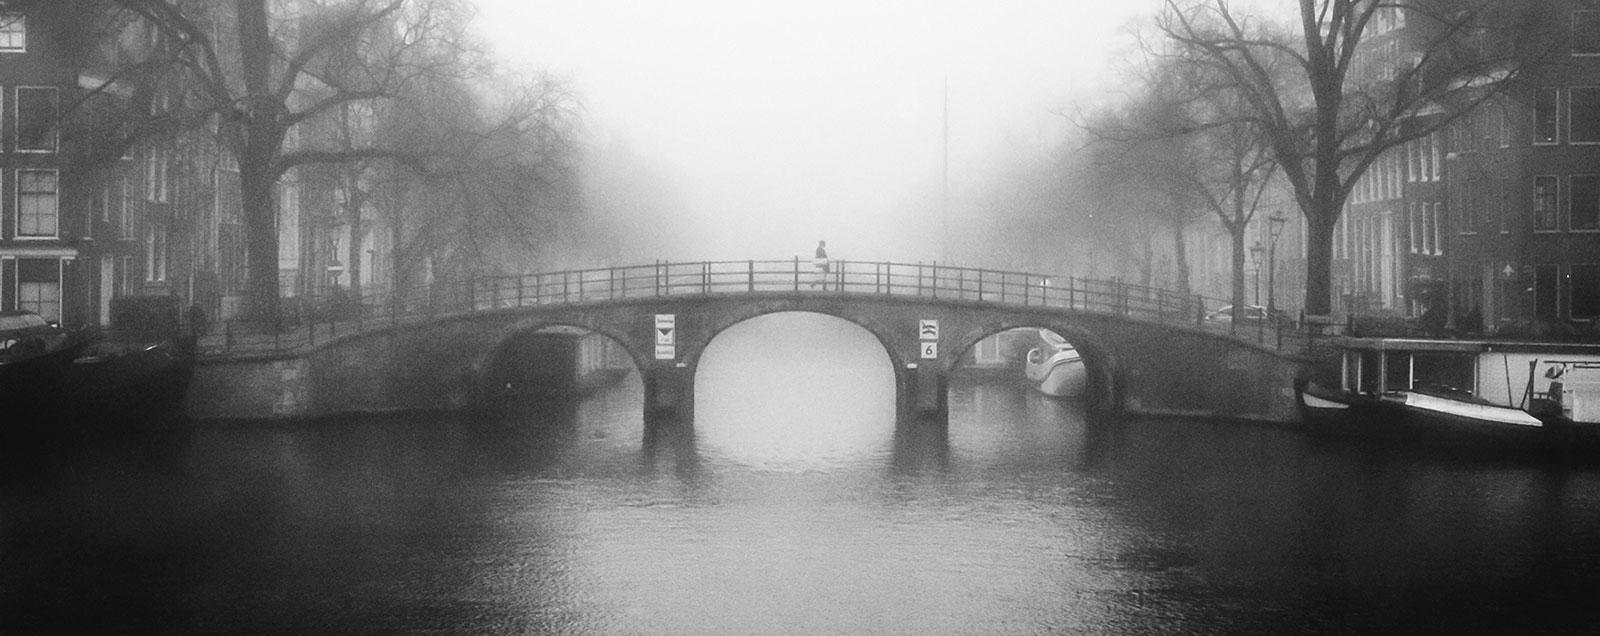 Days of Fog